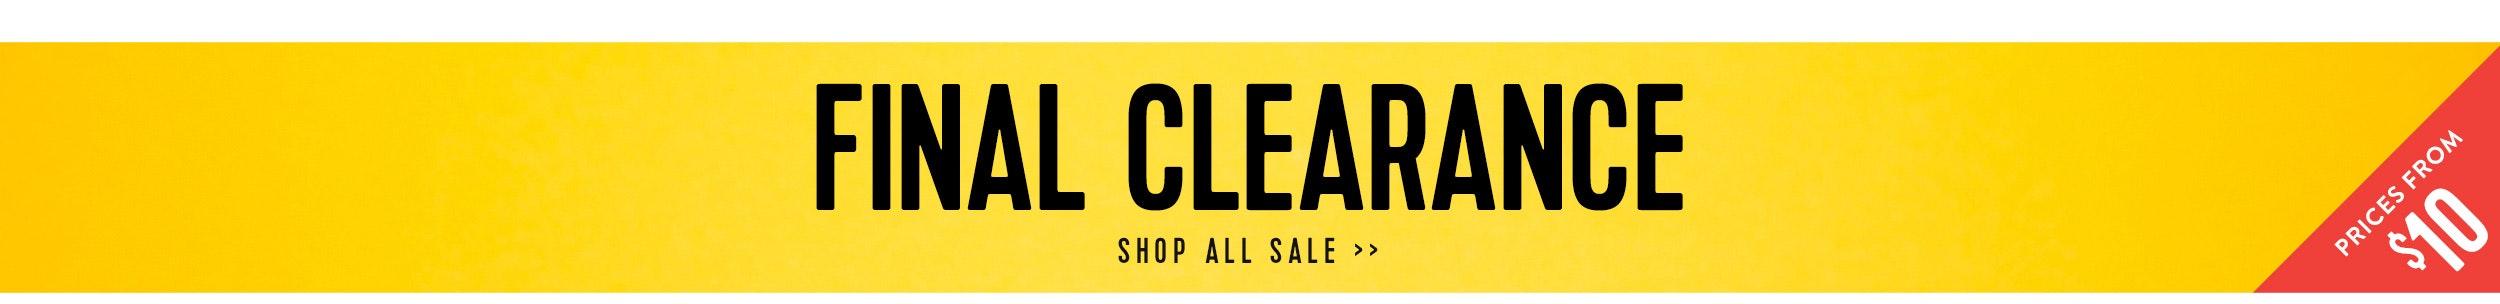 Final Clearance Sale